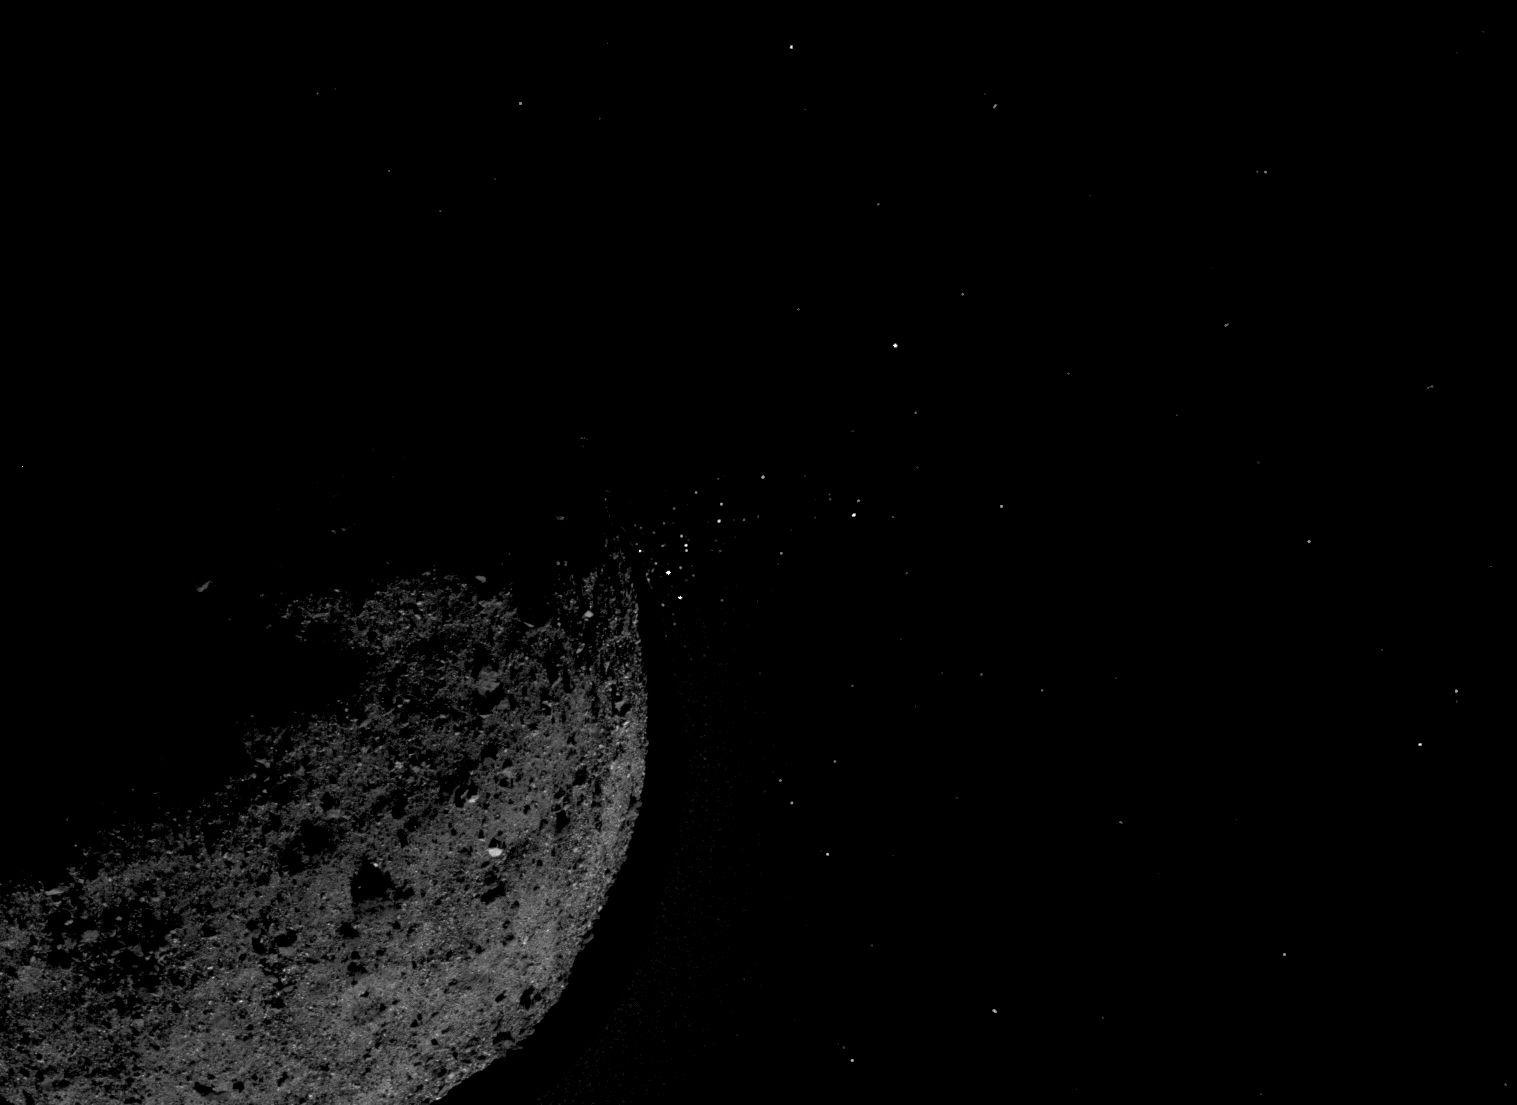 Ejecting particles from Near Earth Asteroid Bennu. Credit: NASA/Goddard/University of Arizona/Lockheed Martin.